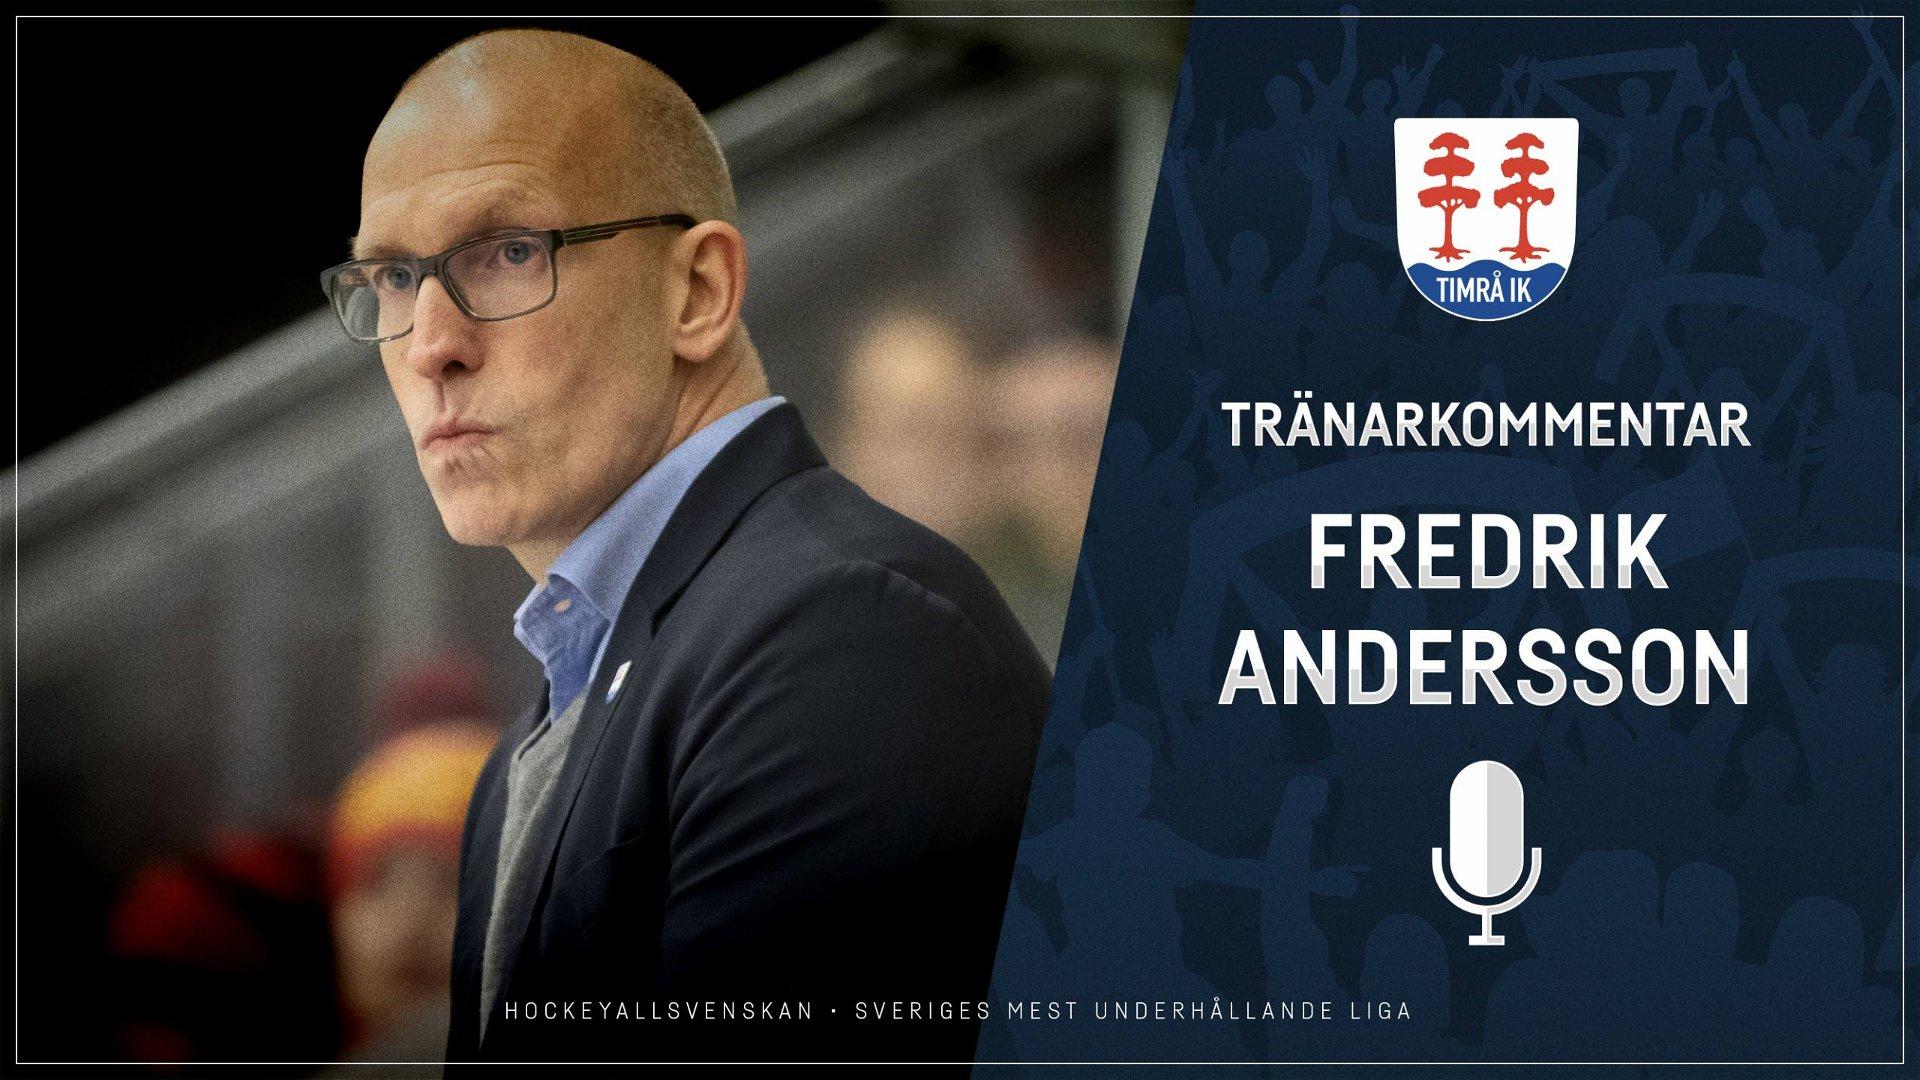 2020-11-13 Segerintervju: Fredrik Andersson